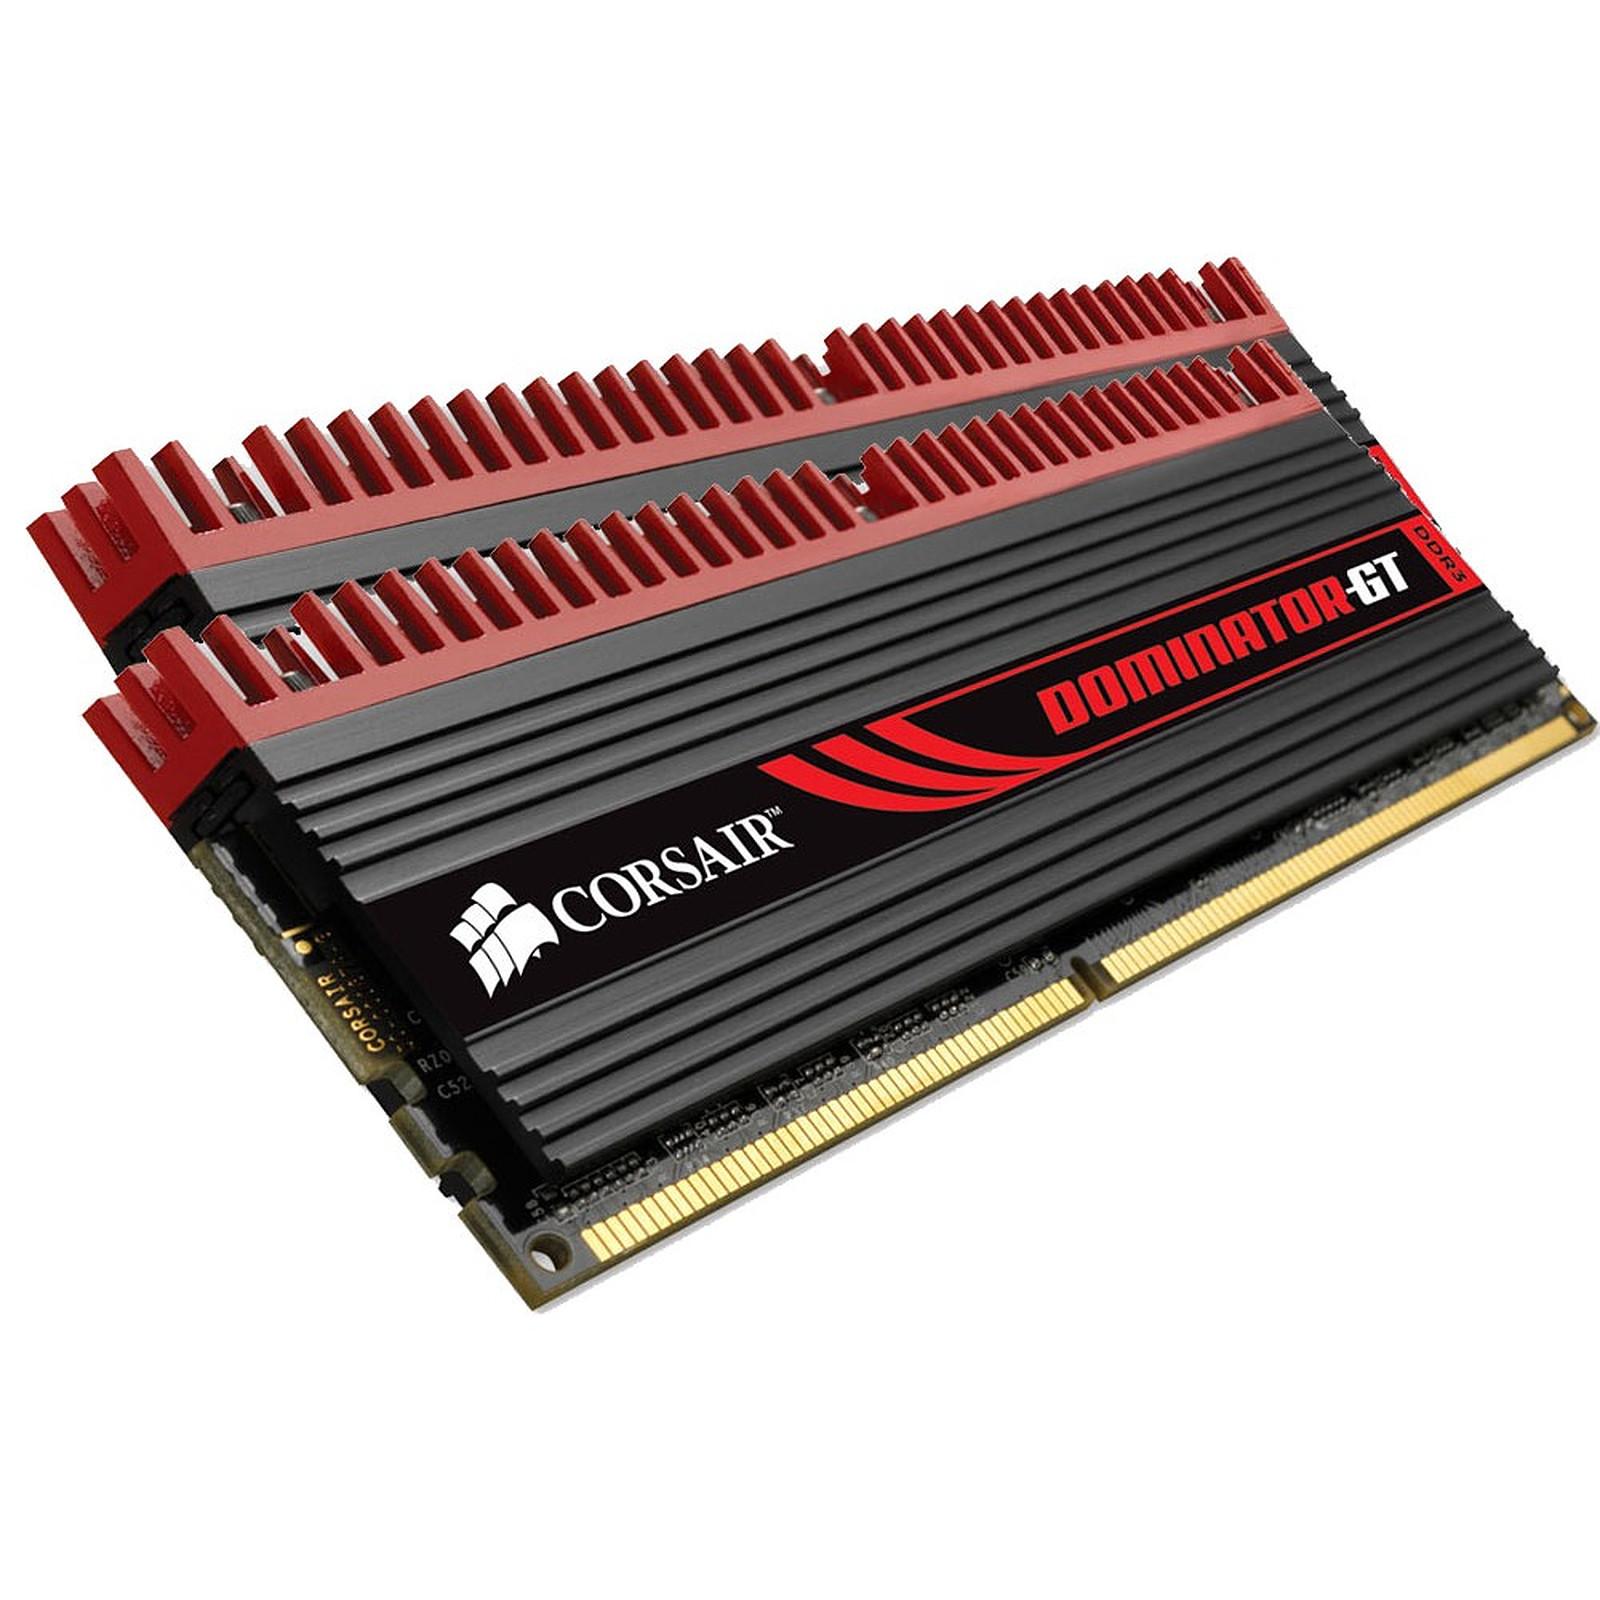 Corsair Dominator-GT 4 Go (kit 2x 2 Go) DDR3-SDRAM PC3-12800 CL7 - CMT4GX3M2A1600C7